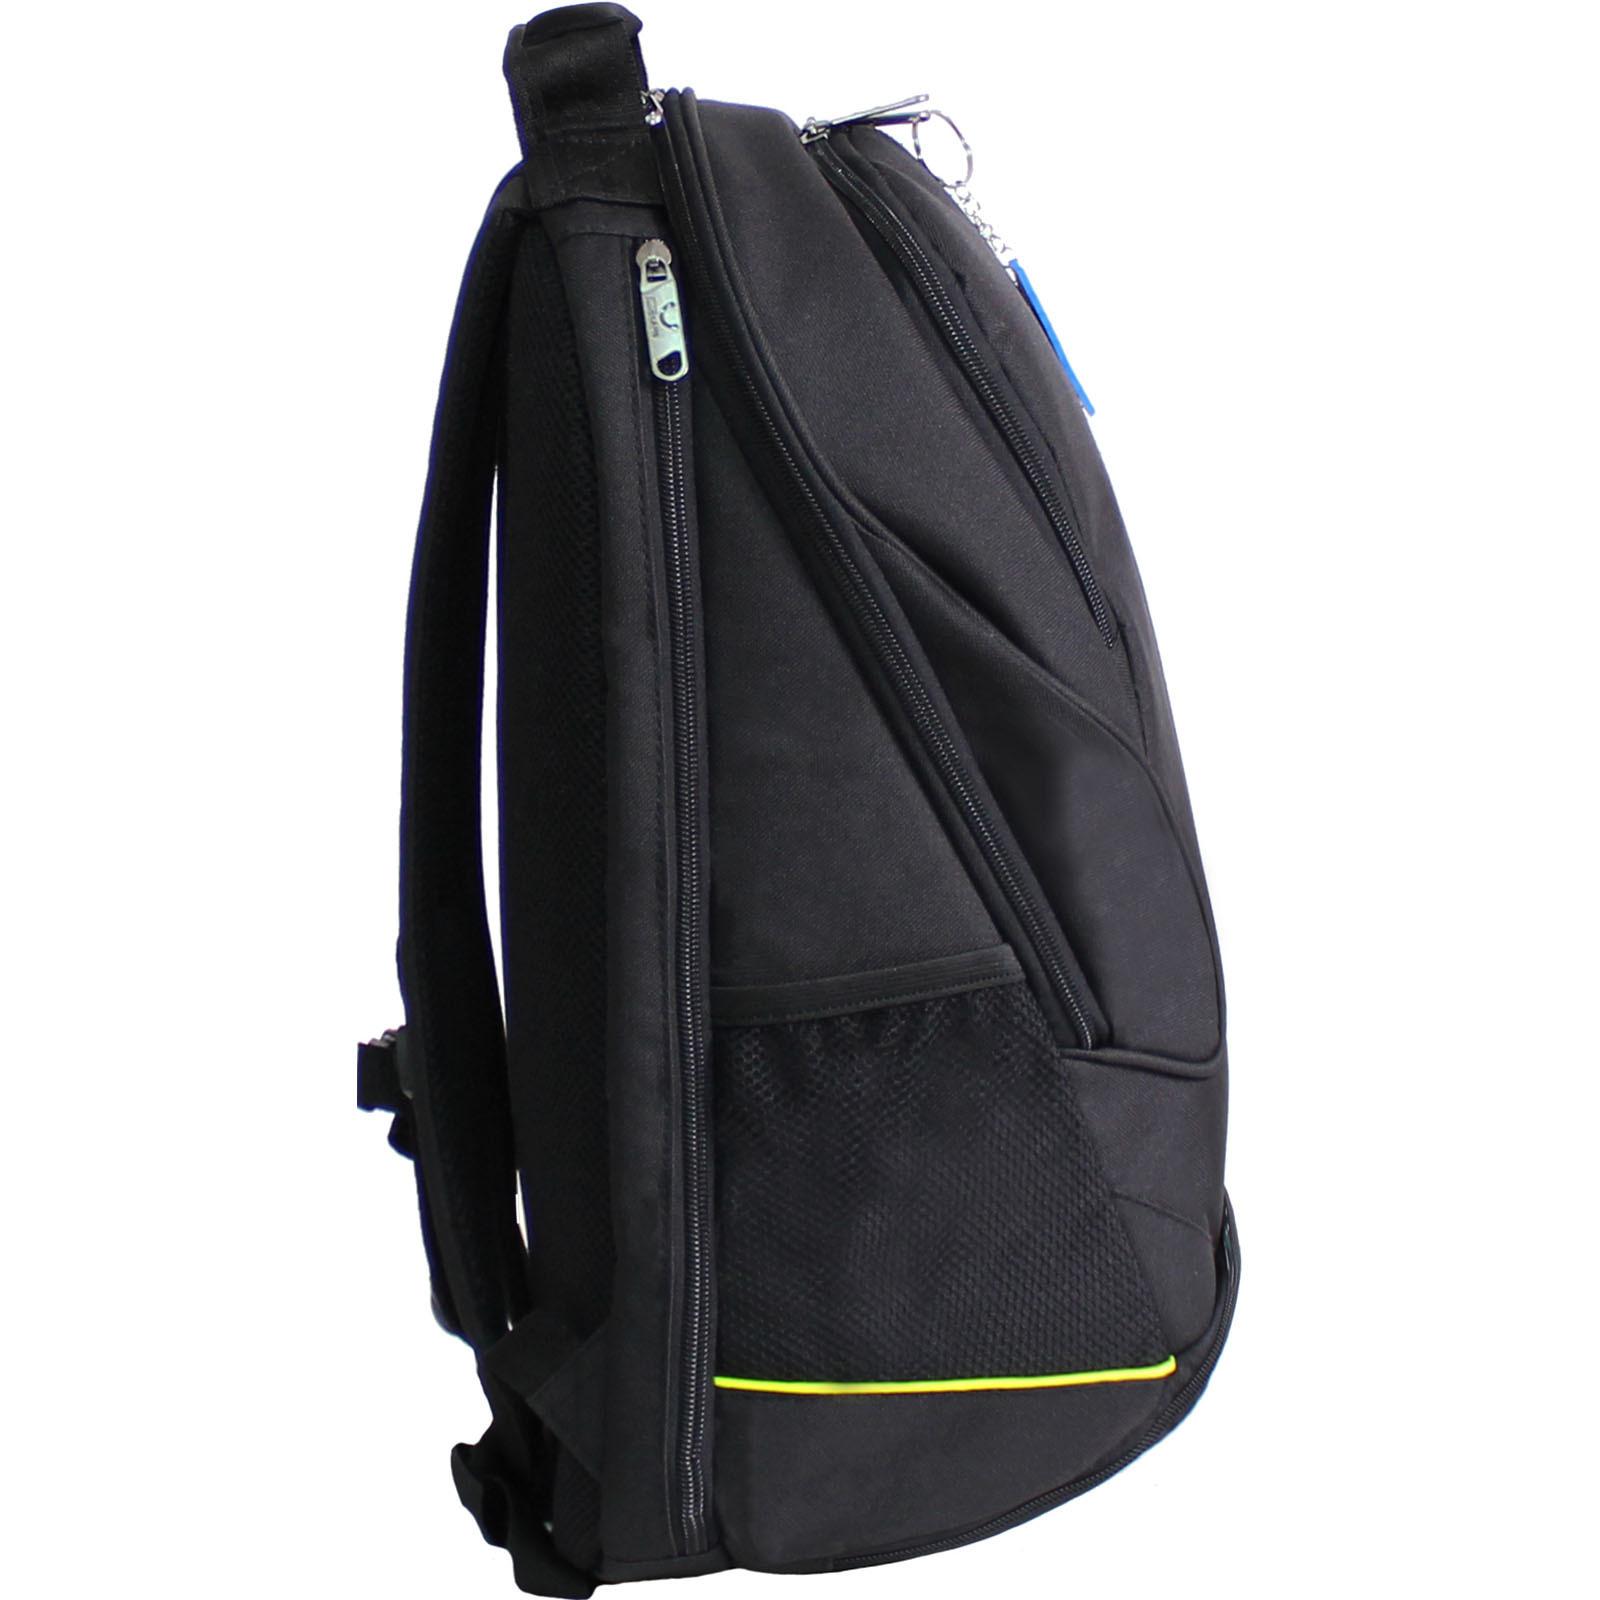 Рюкзак для ноутбука Bagland Рюкзак ZOOTY 24 л. Чёрный (00531662) фото 2